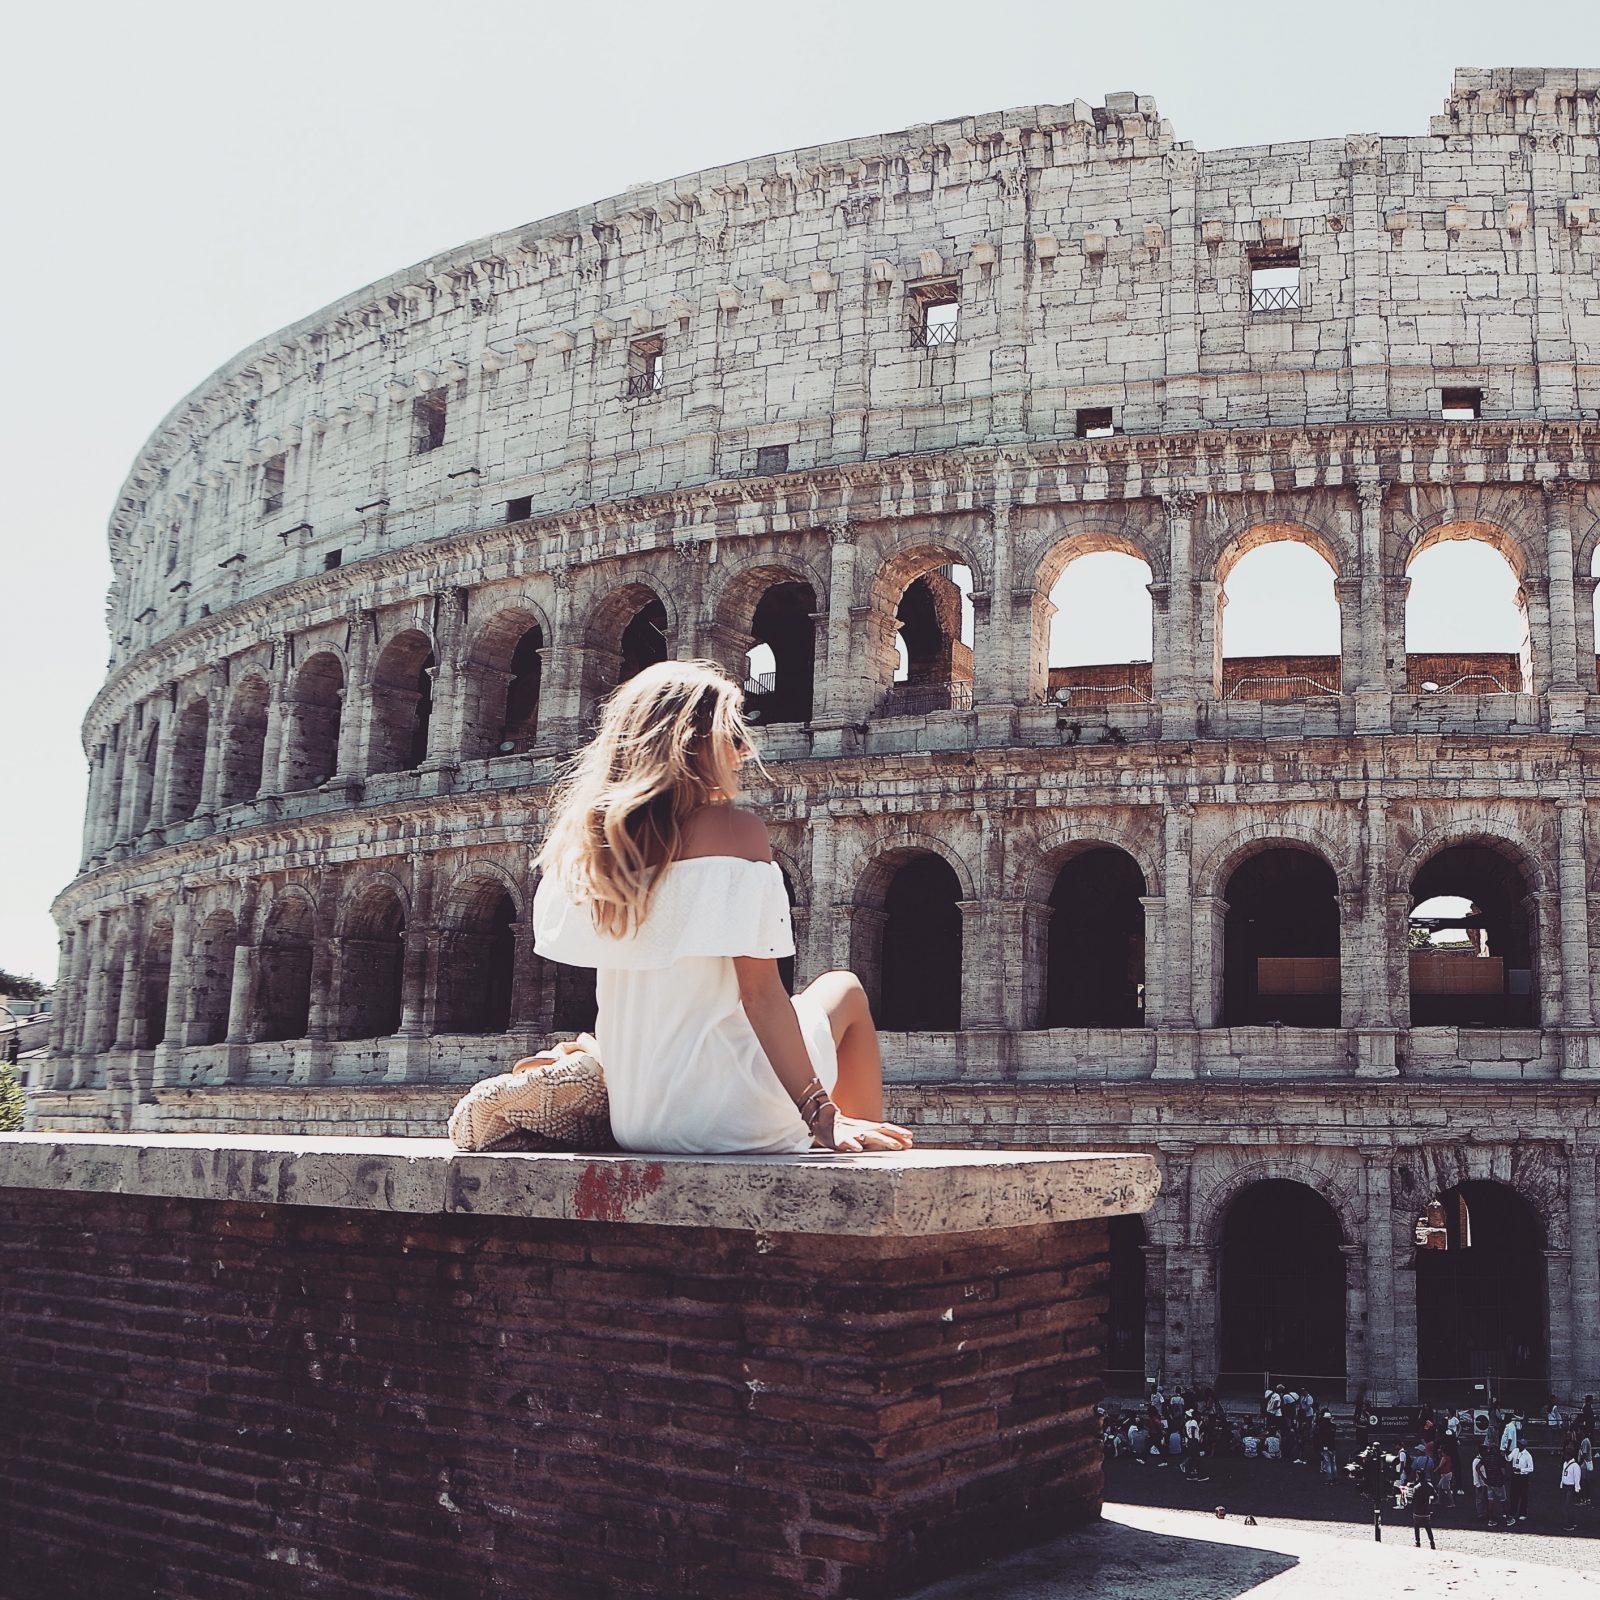 Holiday Lookbook - Rome Colosseum